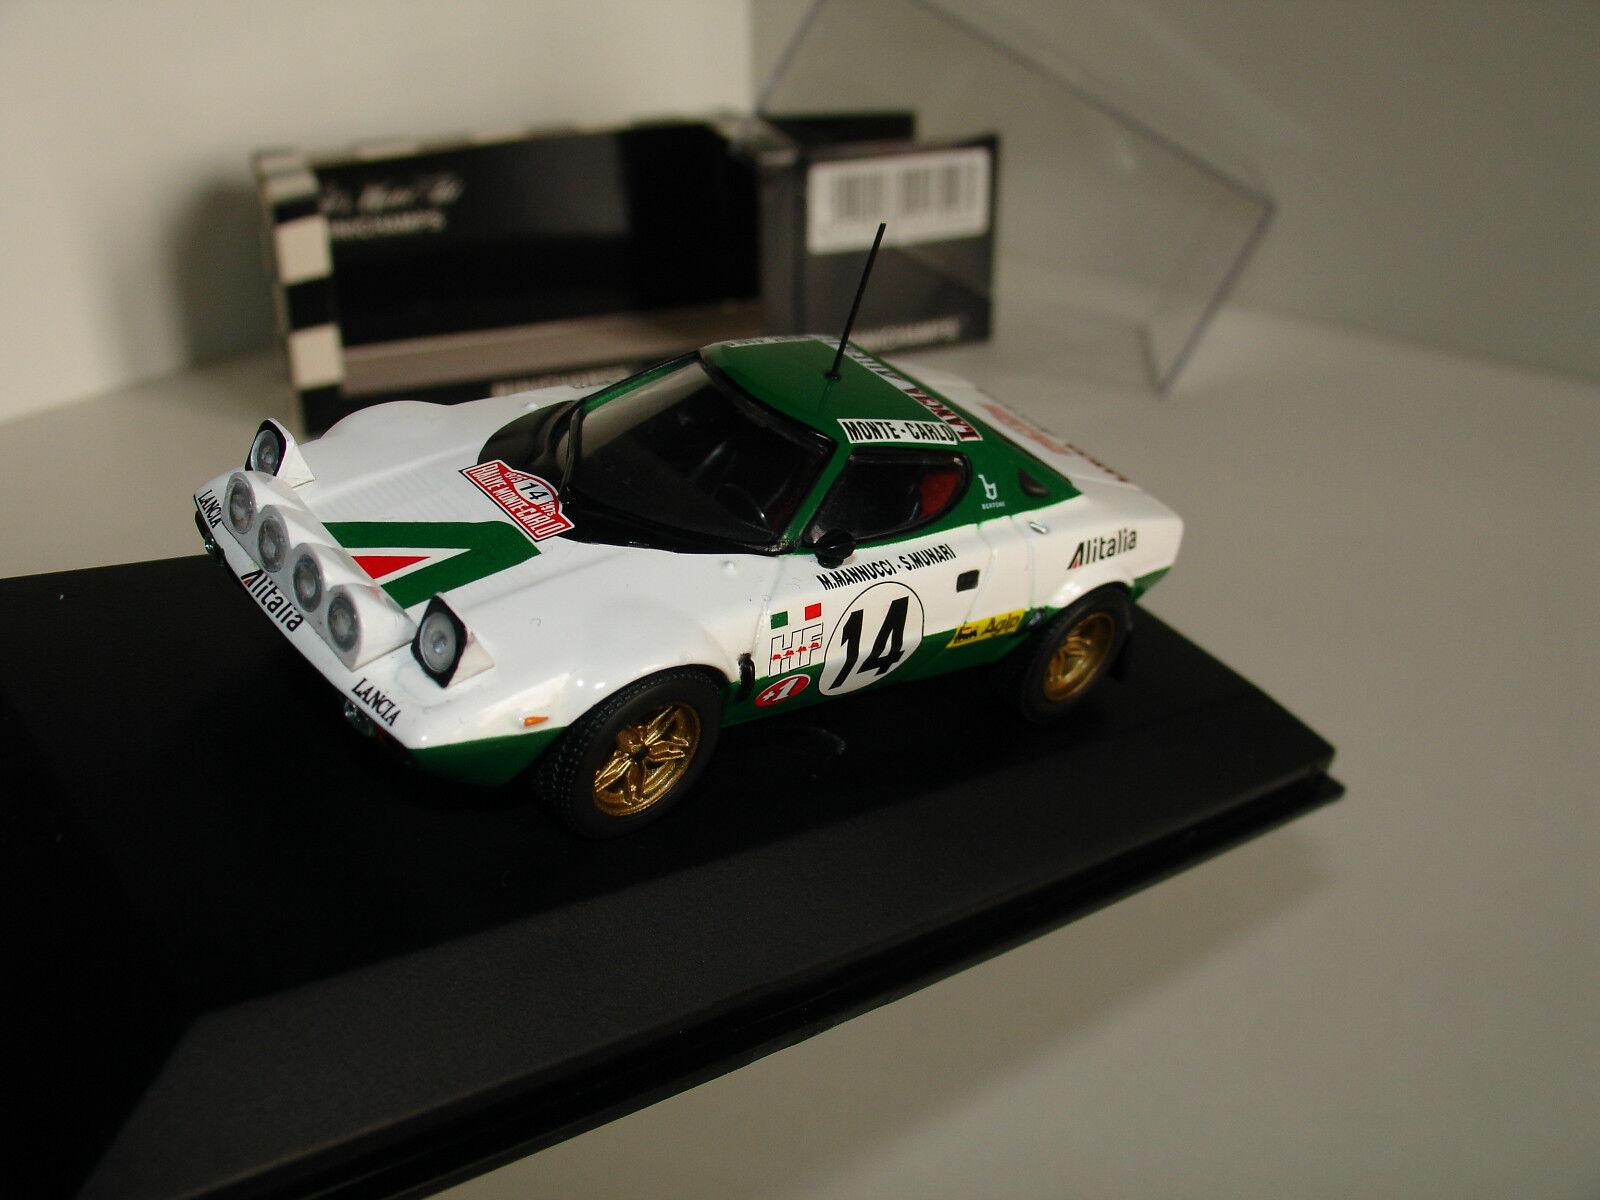 contador genuino 1 43 Lancia Stratos  14  Alitalia  1st 1st 1st MonteCochelo 1975 S. Munari por Minichamps  grandes ofertas